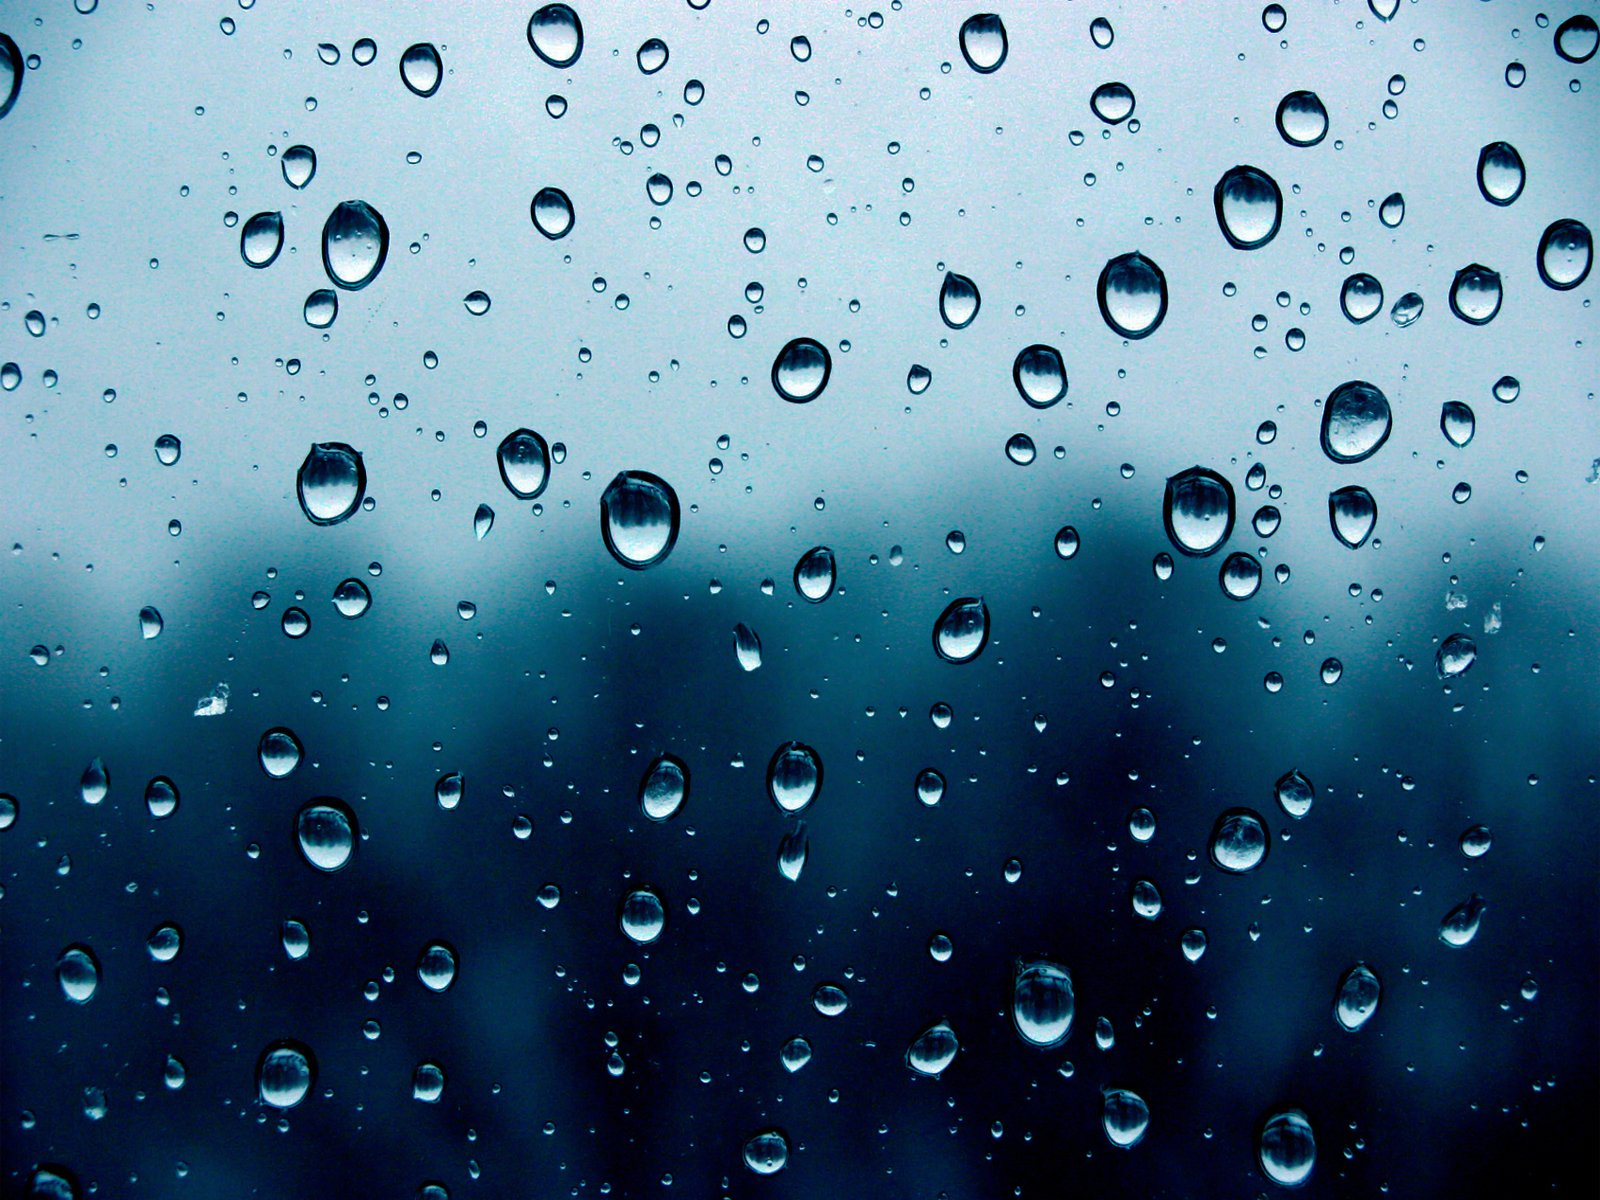 Free Abstract Wallpaper; Water Drops Wallpaper ...